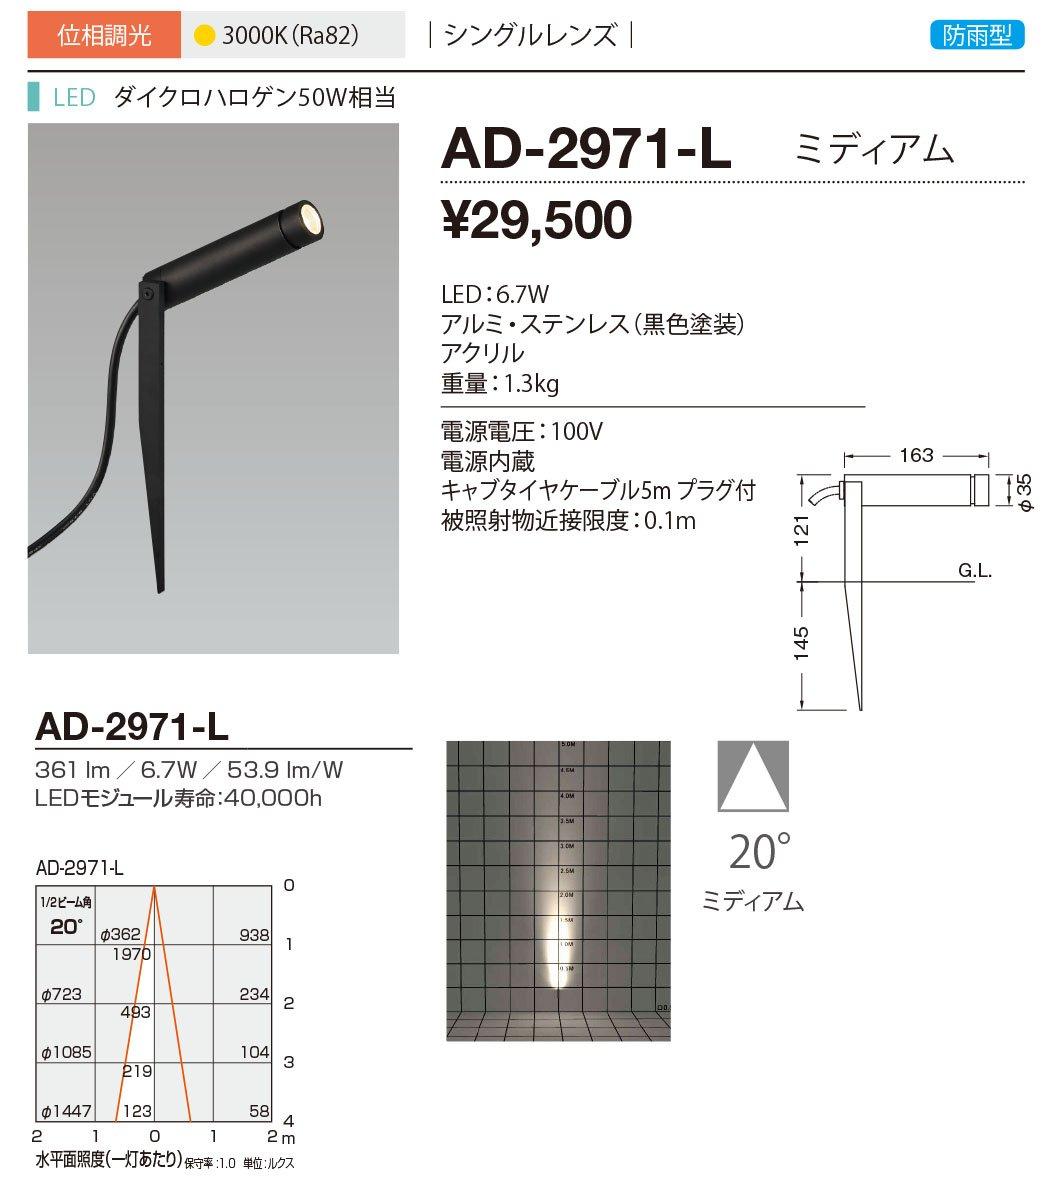 AD-2971-L 山田照明 電球色LEDアウトドアスポットライト(ダイクロハロゲン50W相当) B01M0D593E 14660